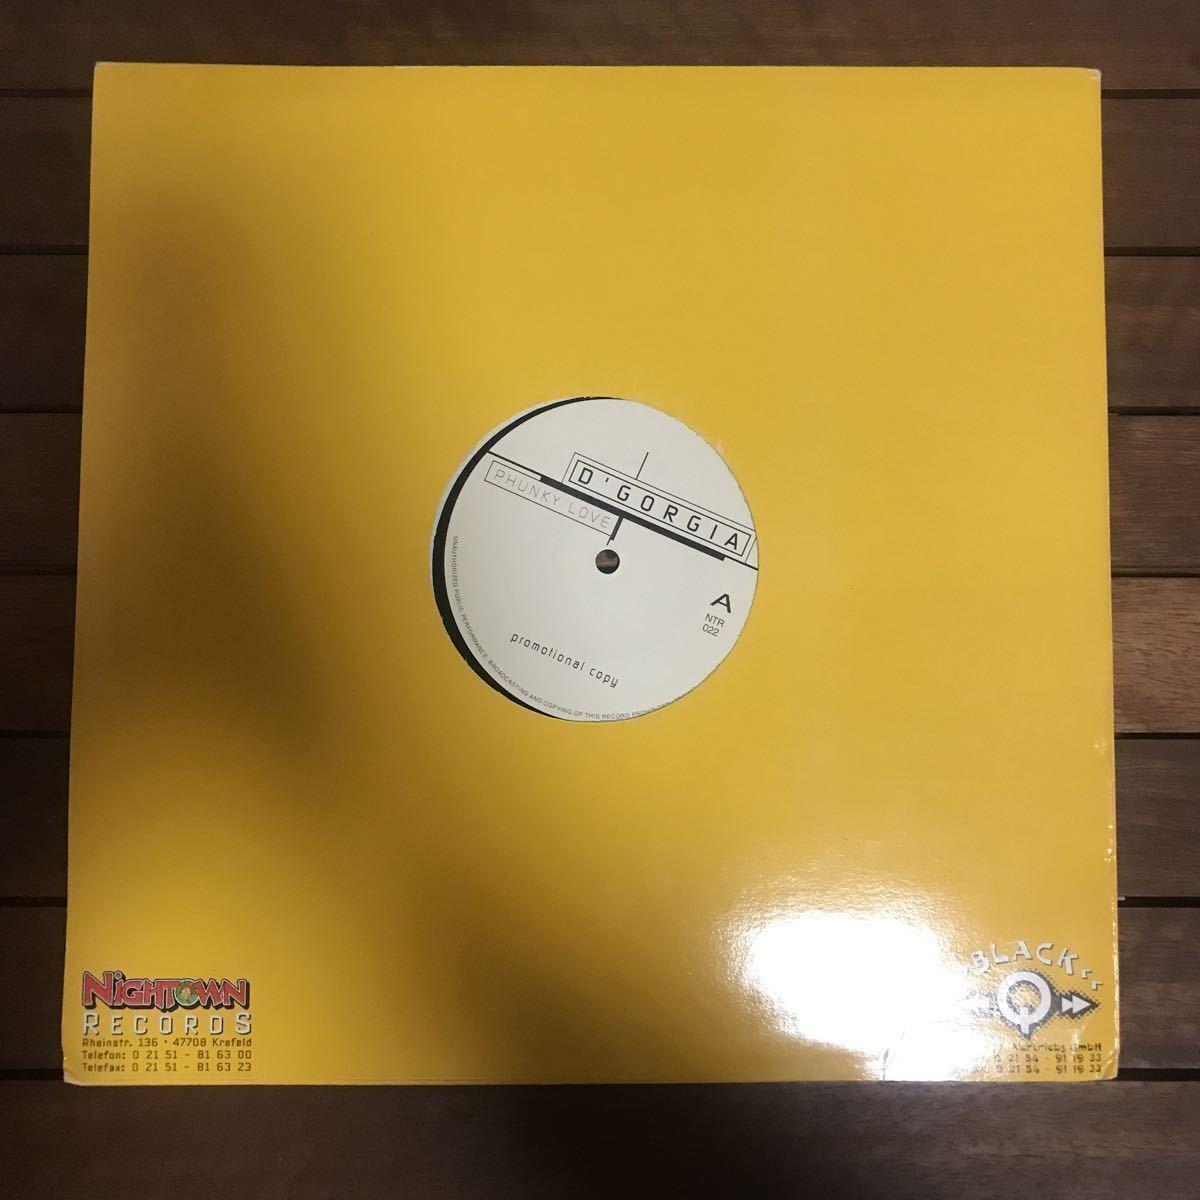 ●【eu-rap】D' Gorgia / Phunky Love [12inch]オリジナル盤 nightown レーベル